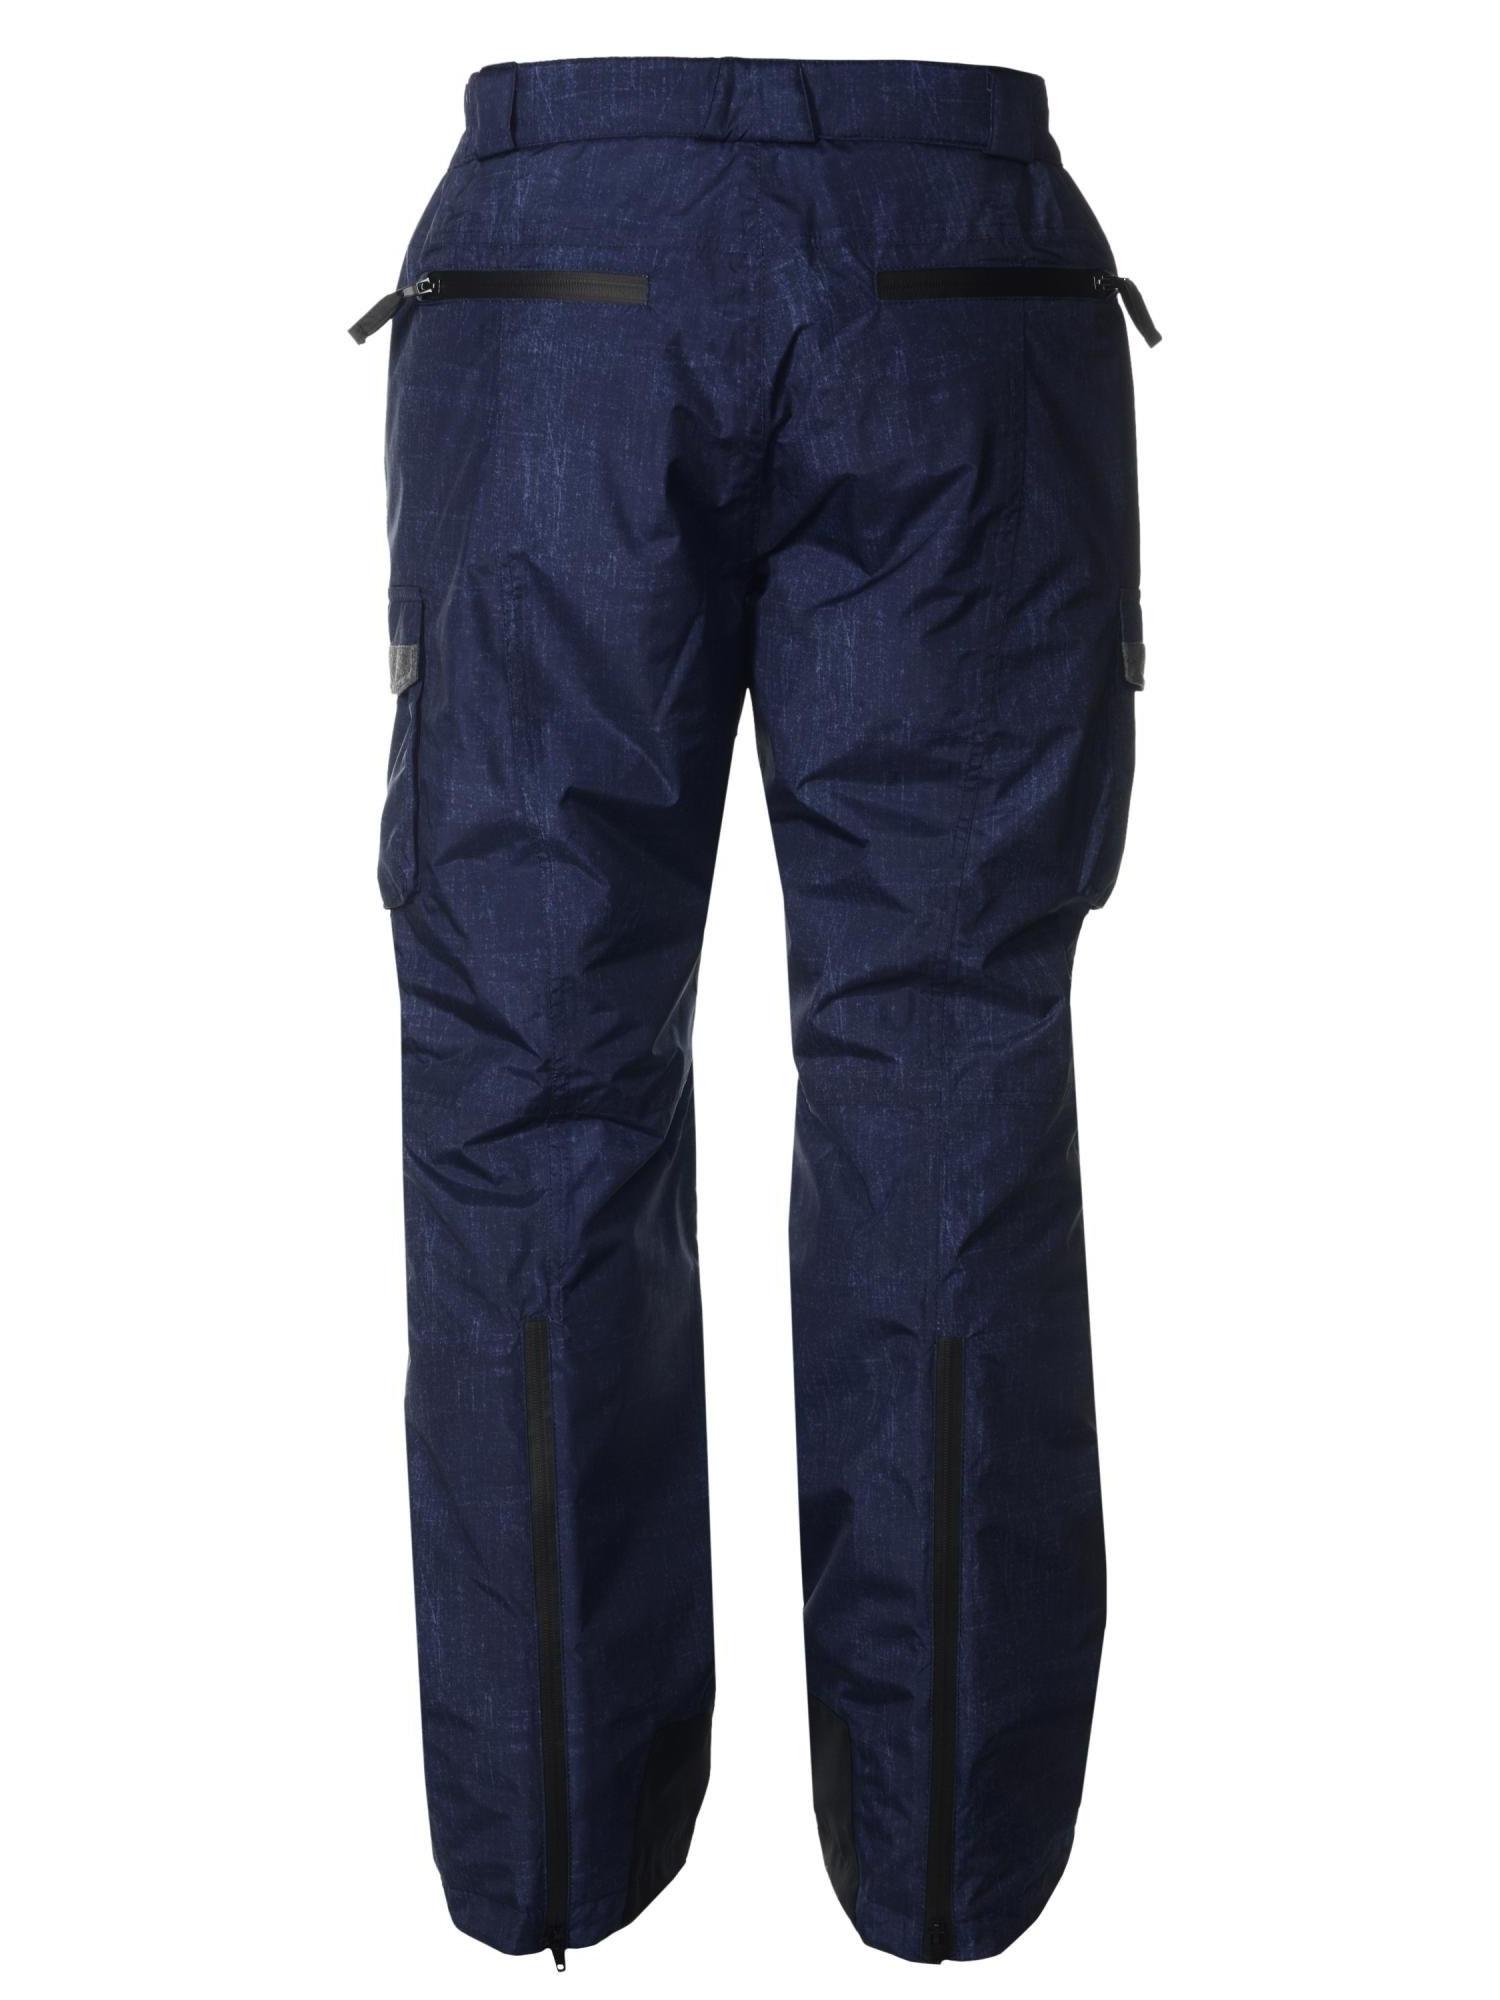 Мужской горнолыжный костюм Almrausch Steinpass-Hochbruck 320109-321300 джинс фото